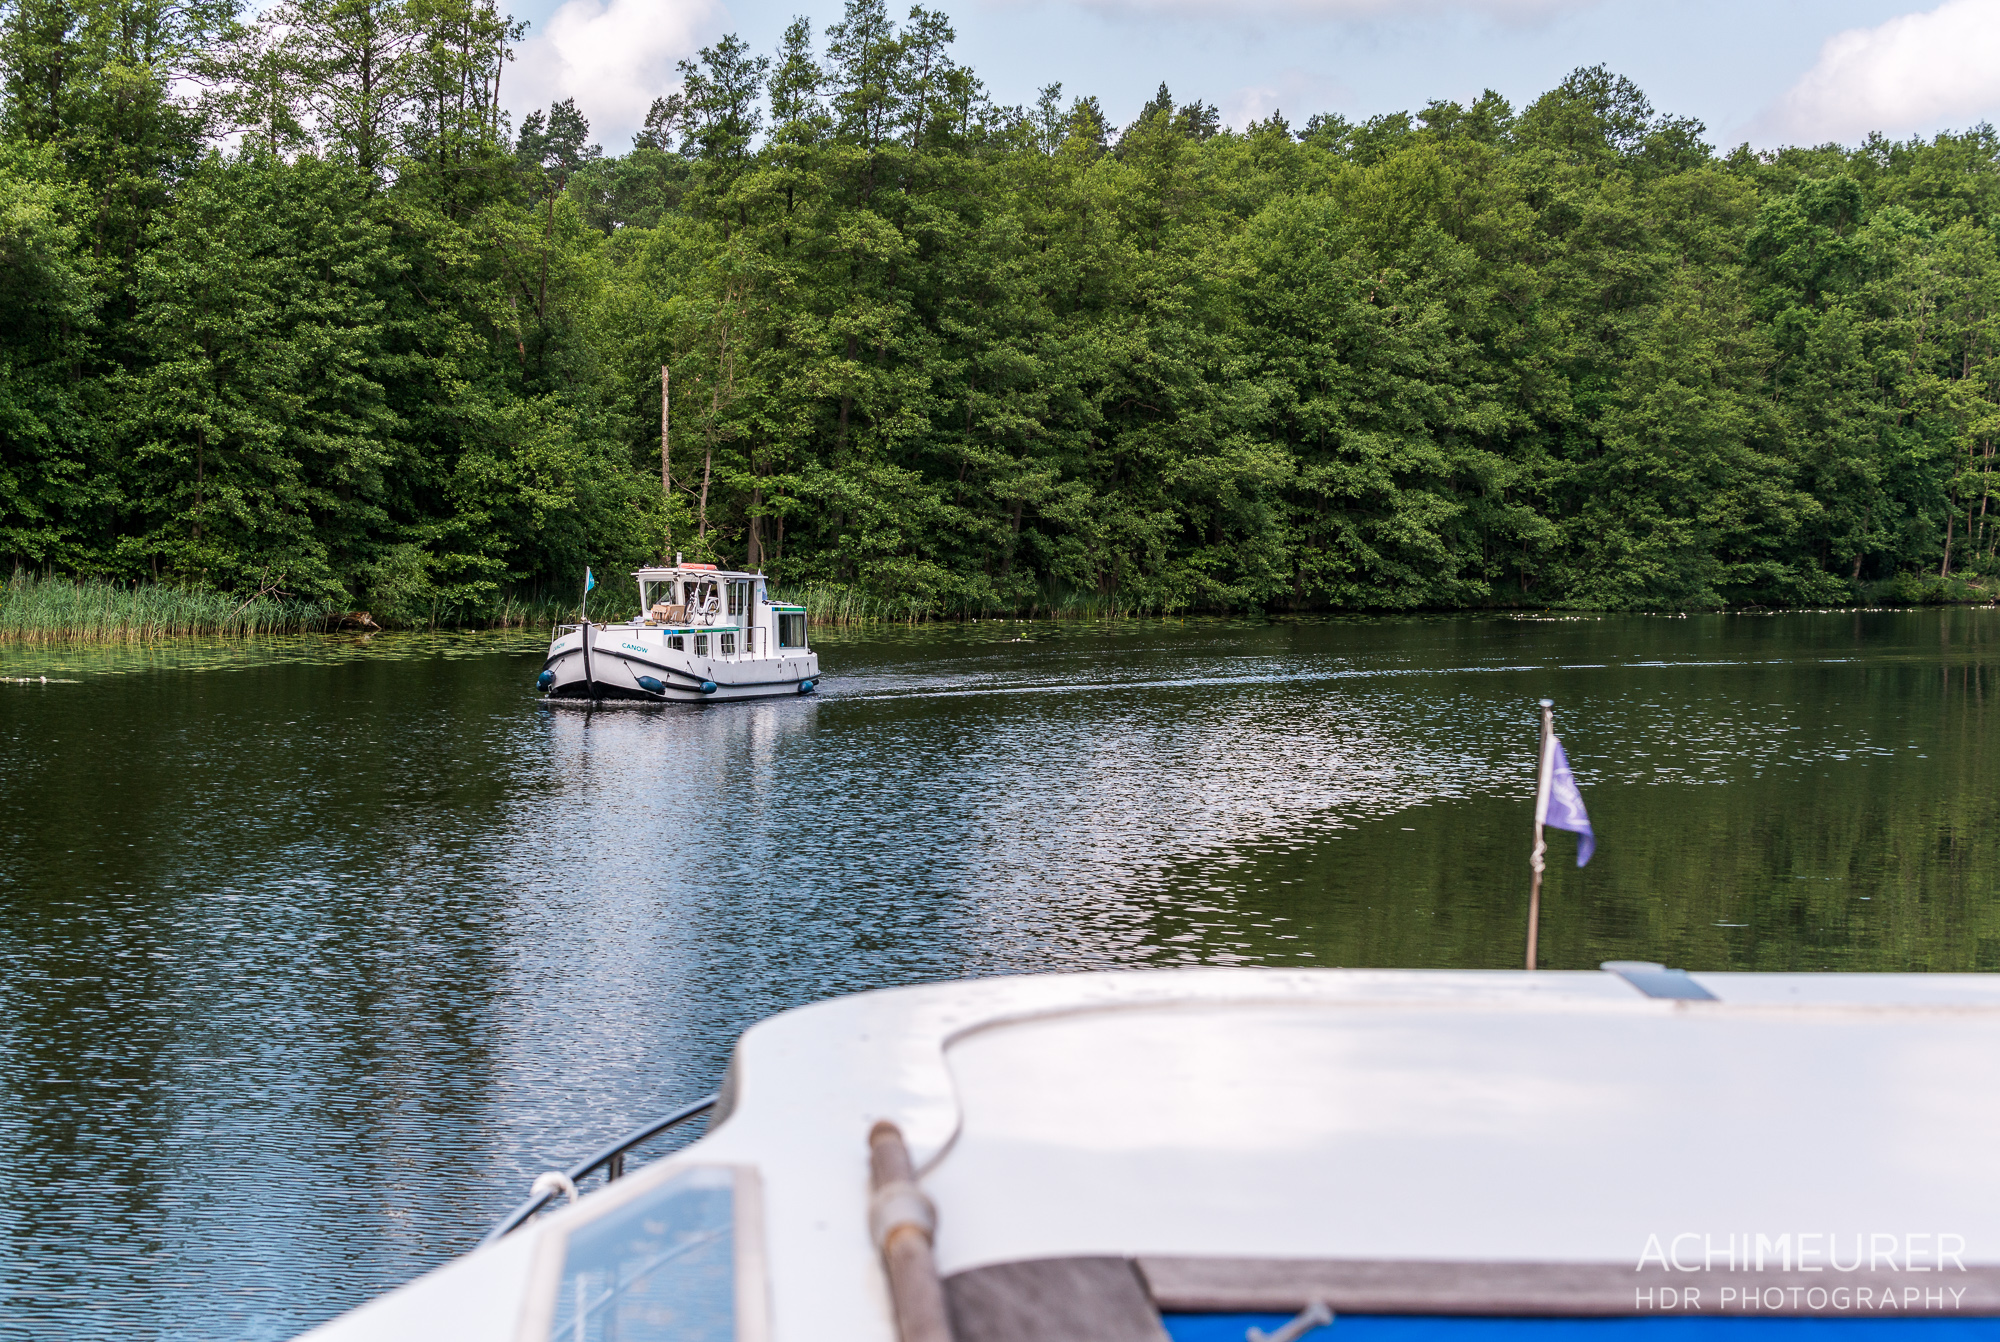 Hausboot-Kuhnle-Mueritz-Mecklenburg-Vorpommern-See_2864